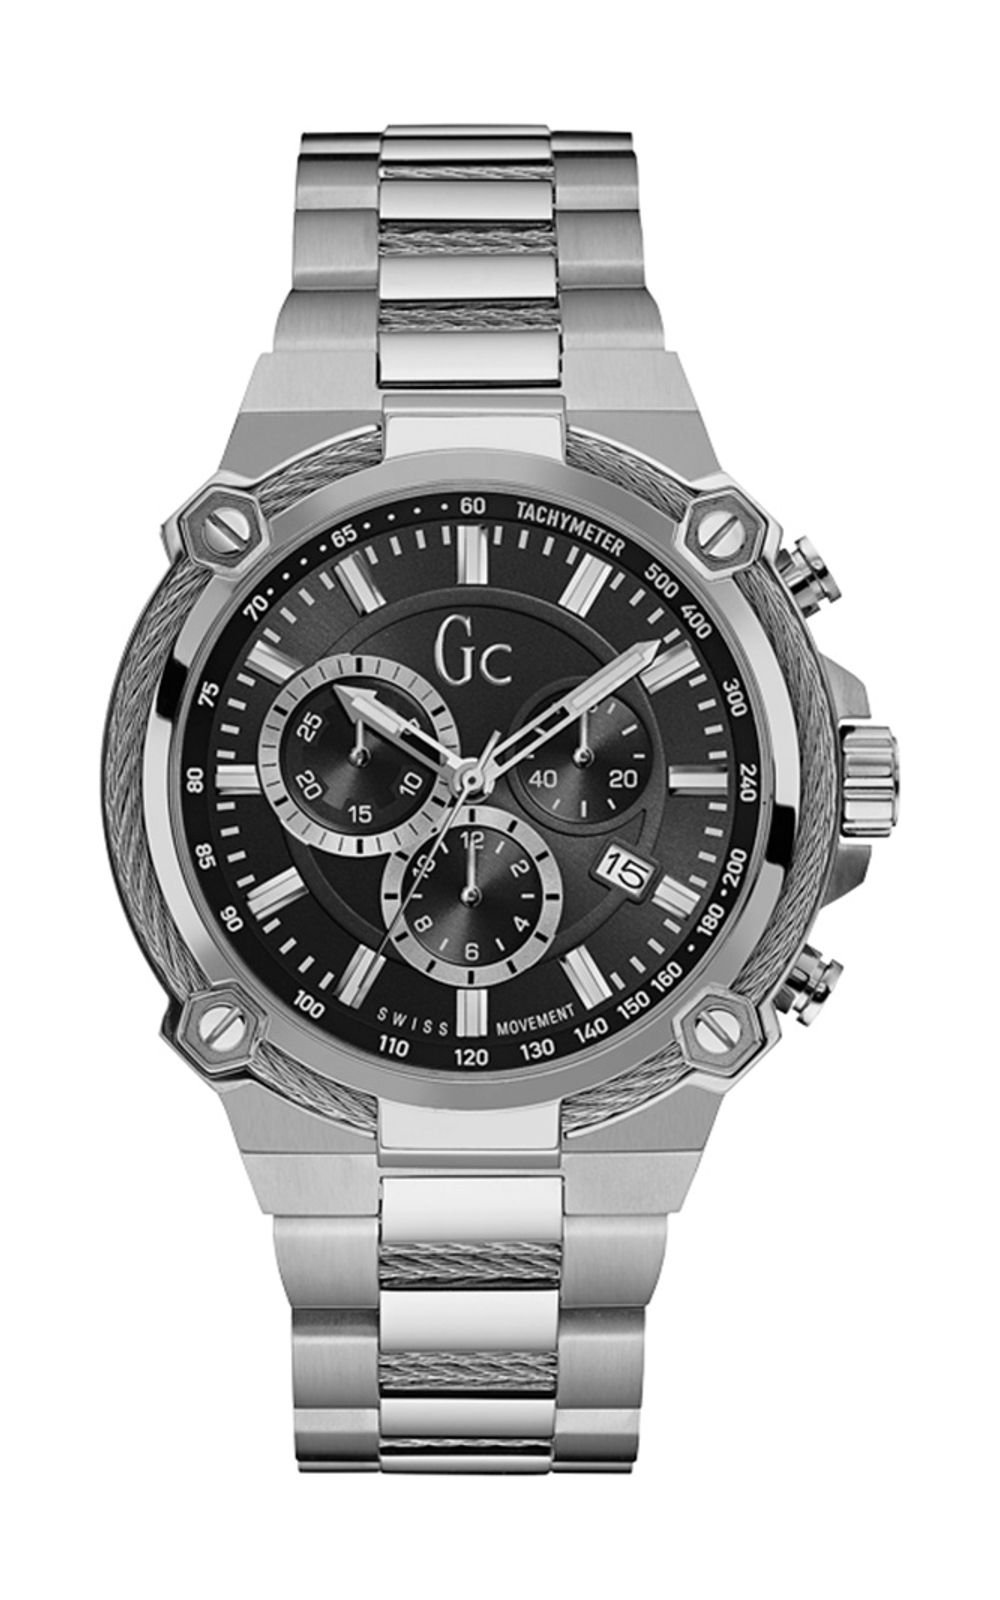 GC Y24003G2 Ανδρικό Ρολόι Quartz Χρονογράφος Ακριβείας